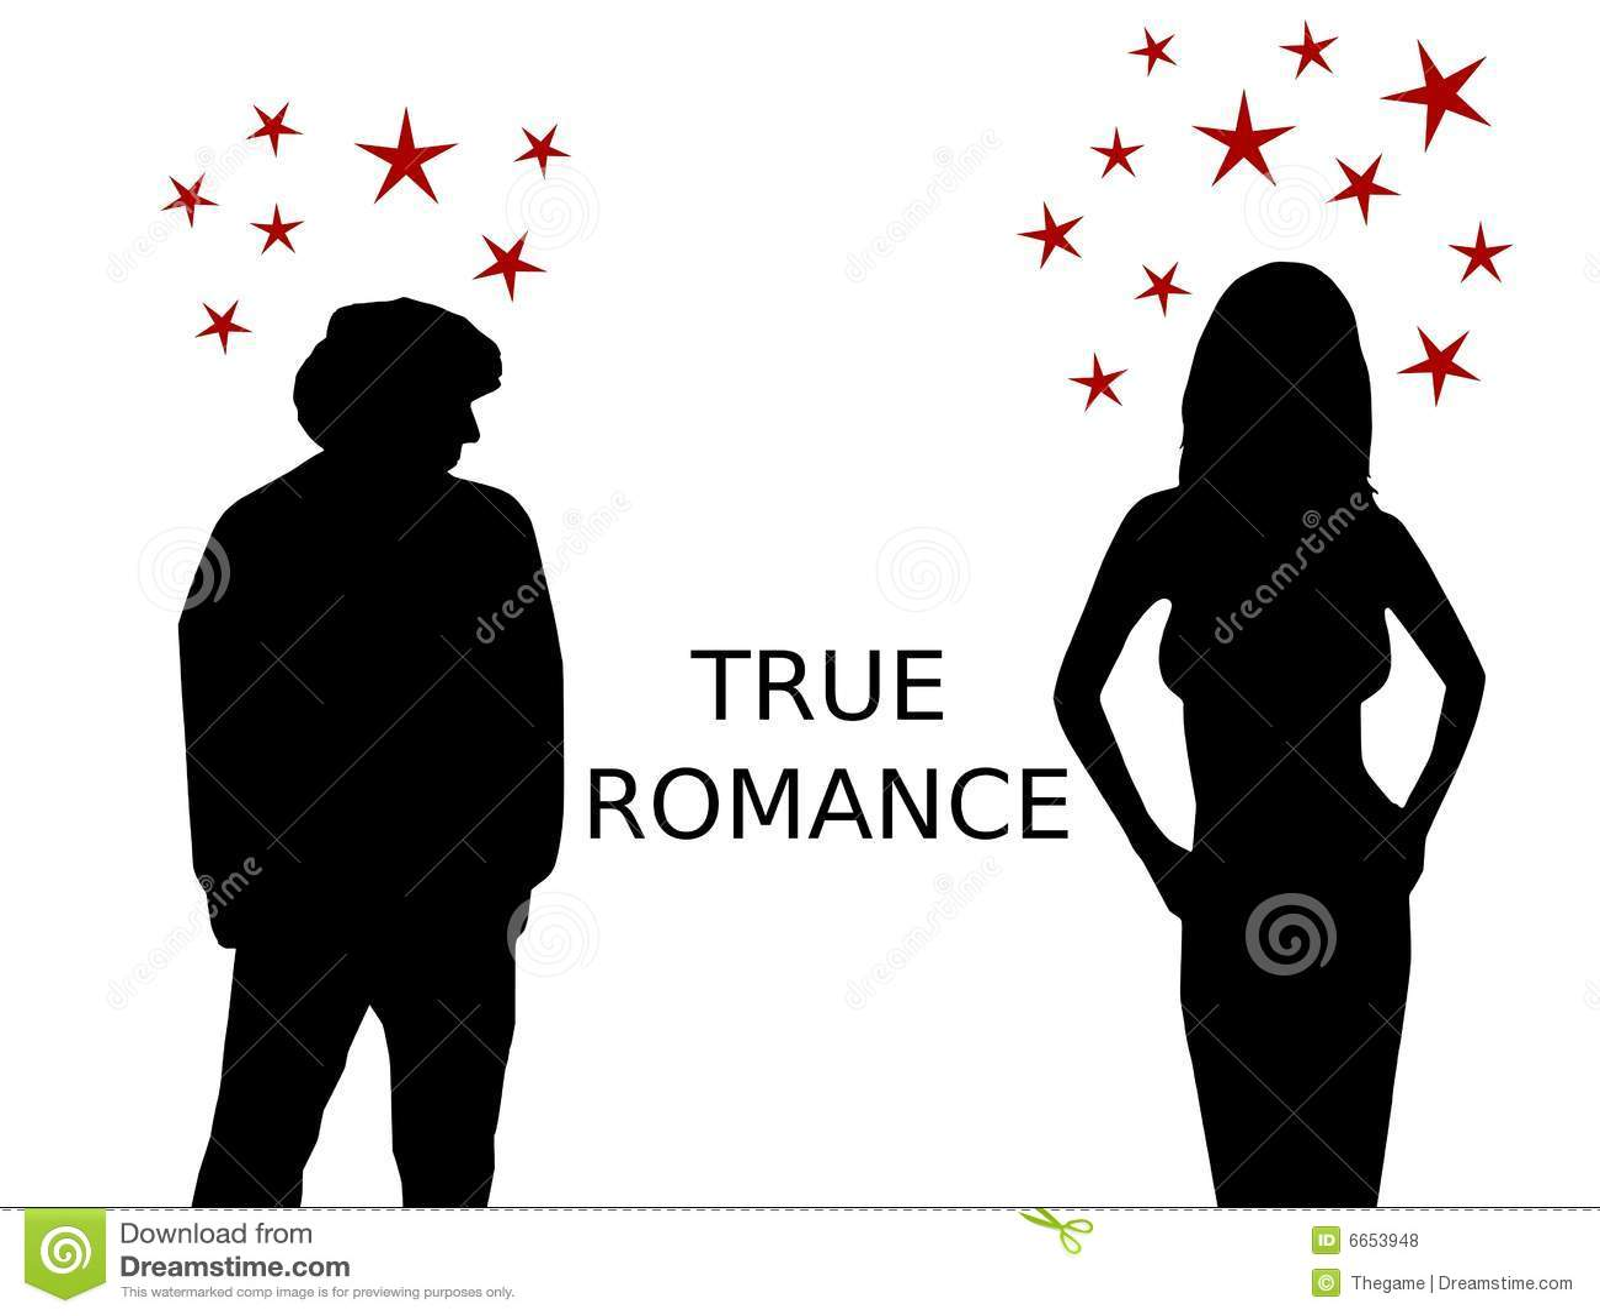 True love online dating